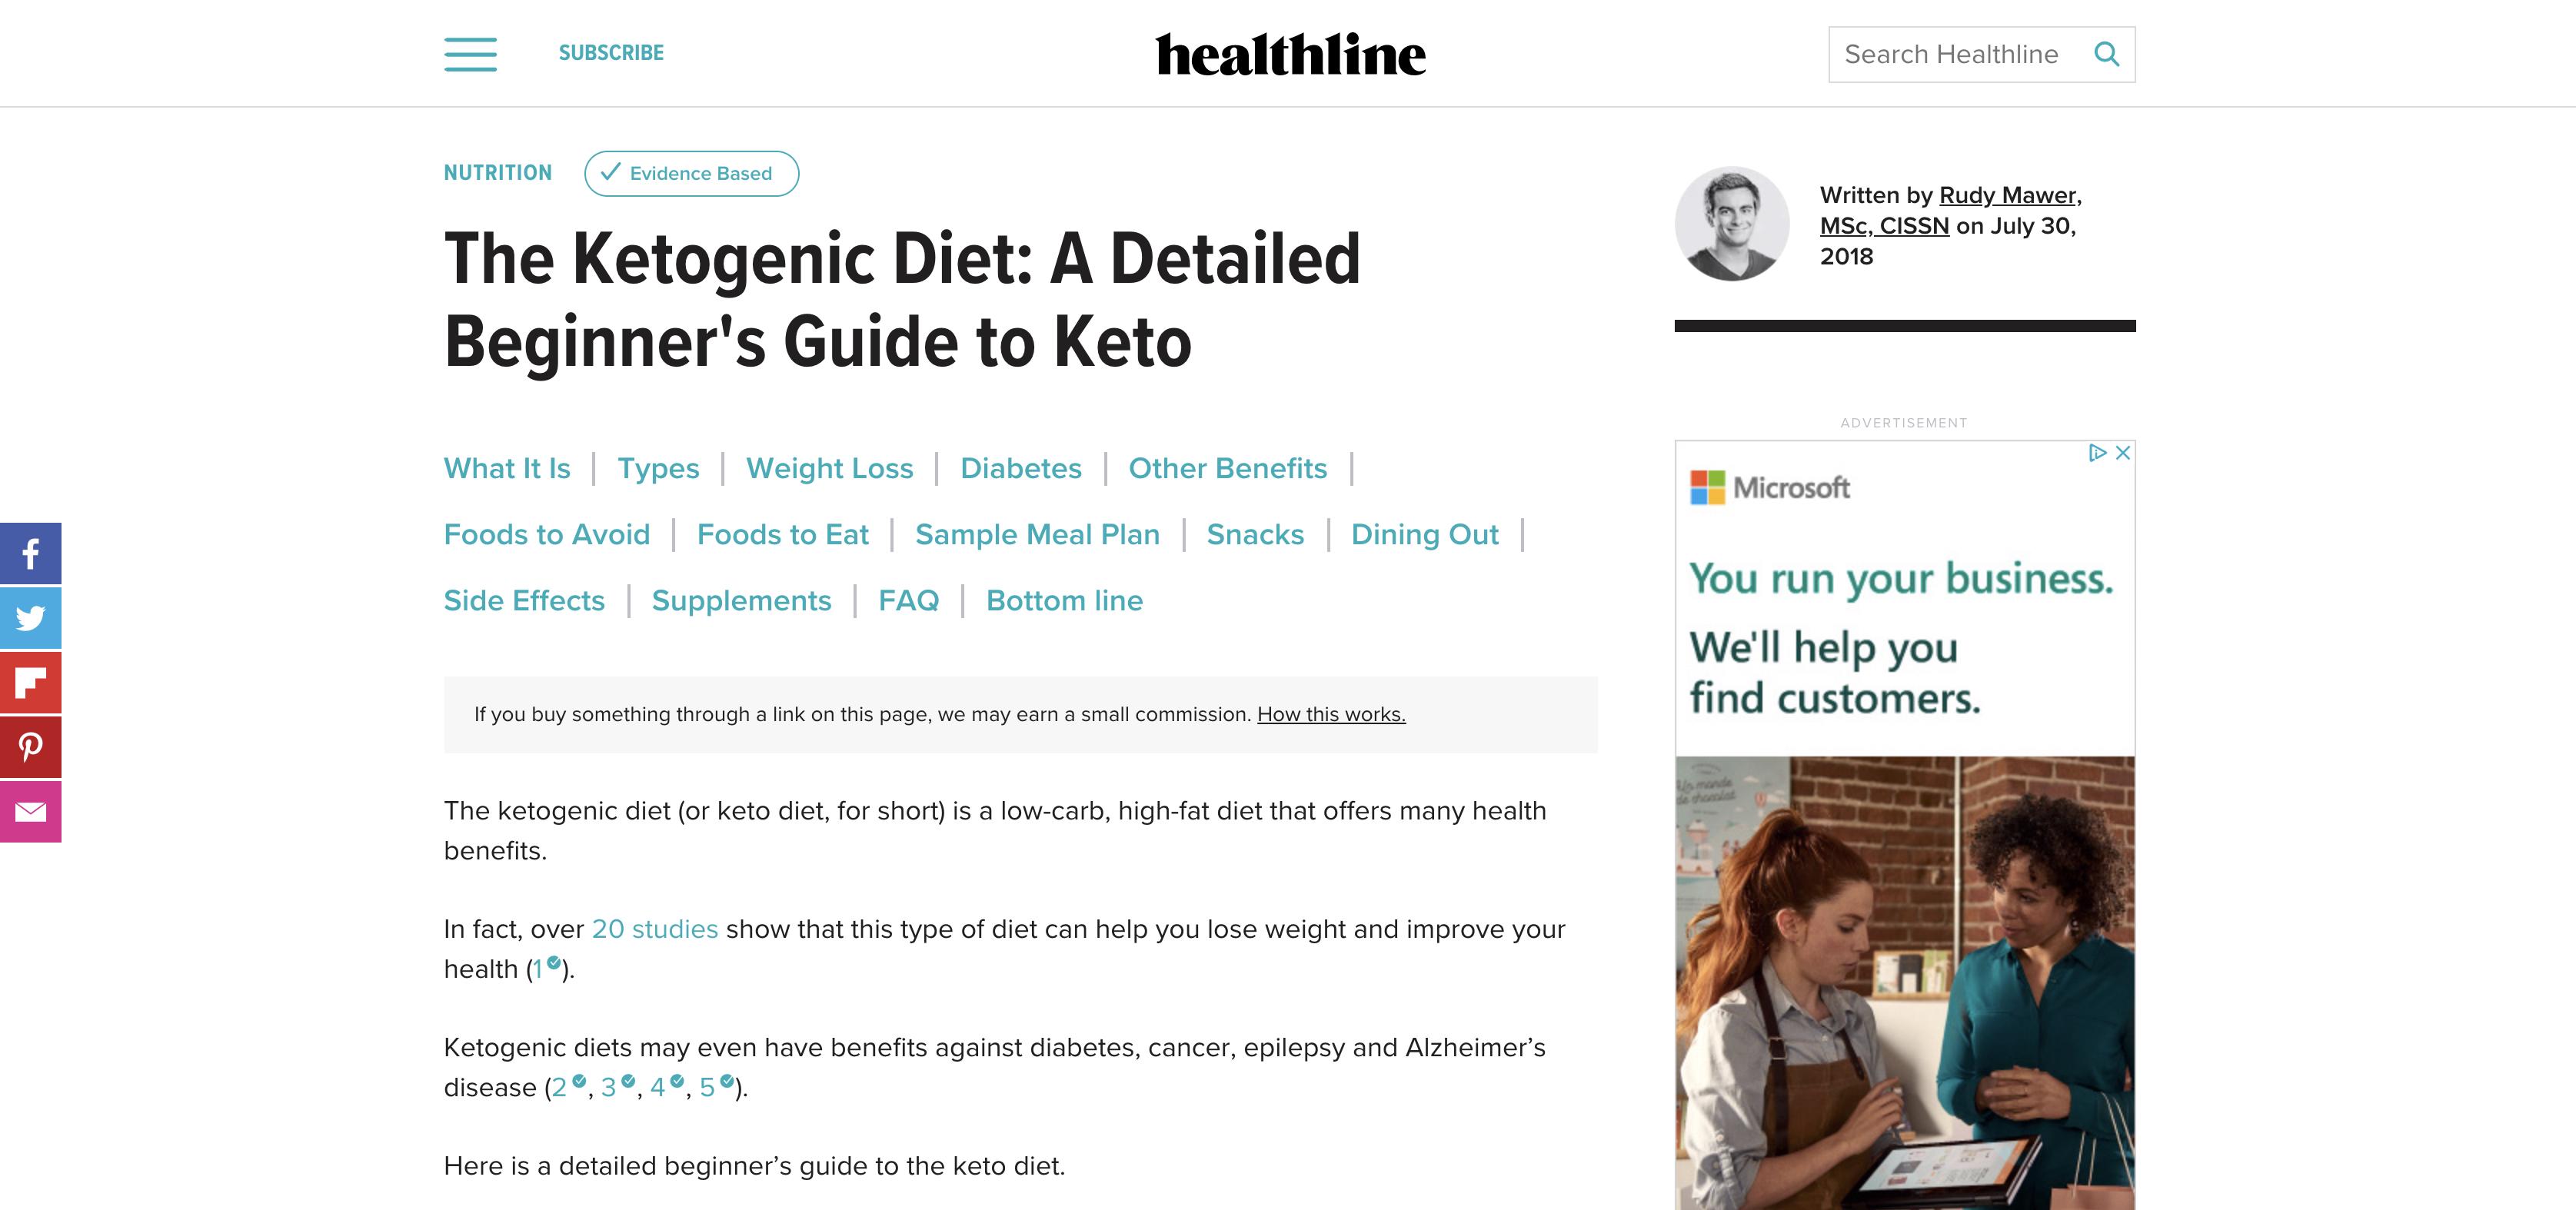 healthline keto diet content screenshot